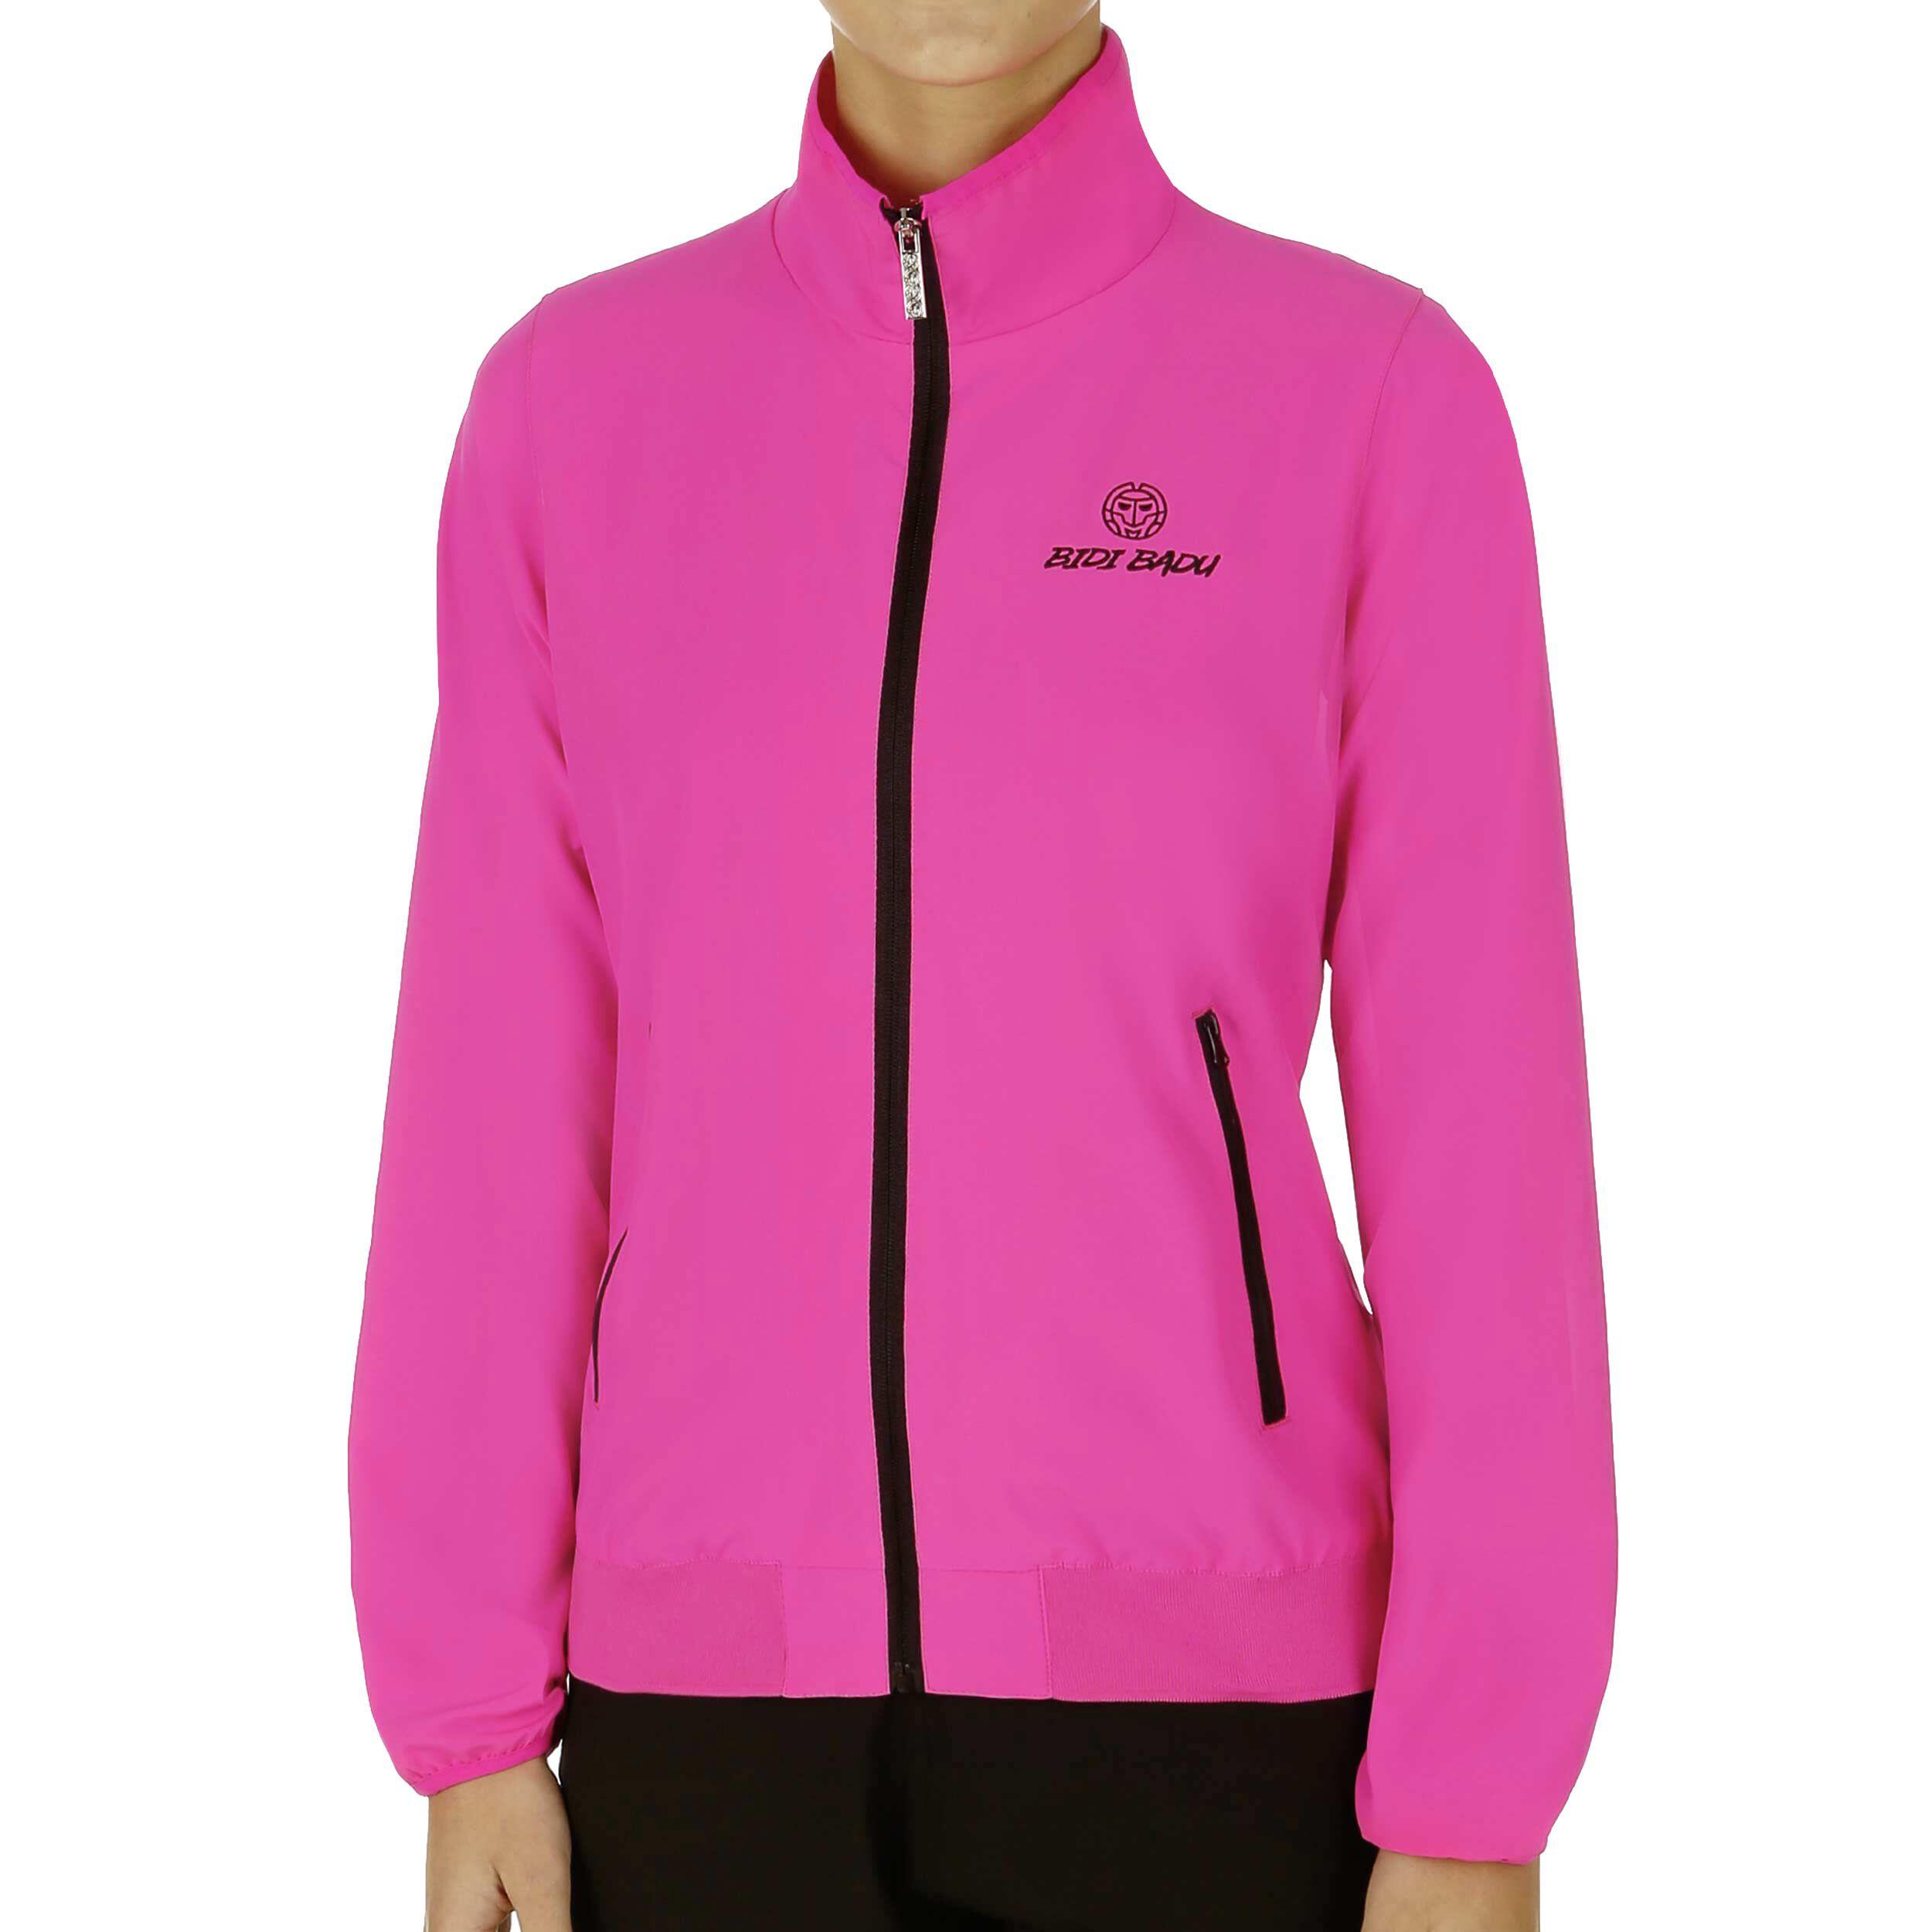 BIDI BADU Liza Tech Trainingsjacke Damen Pink, Schwarz